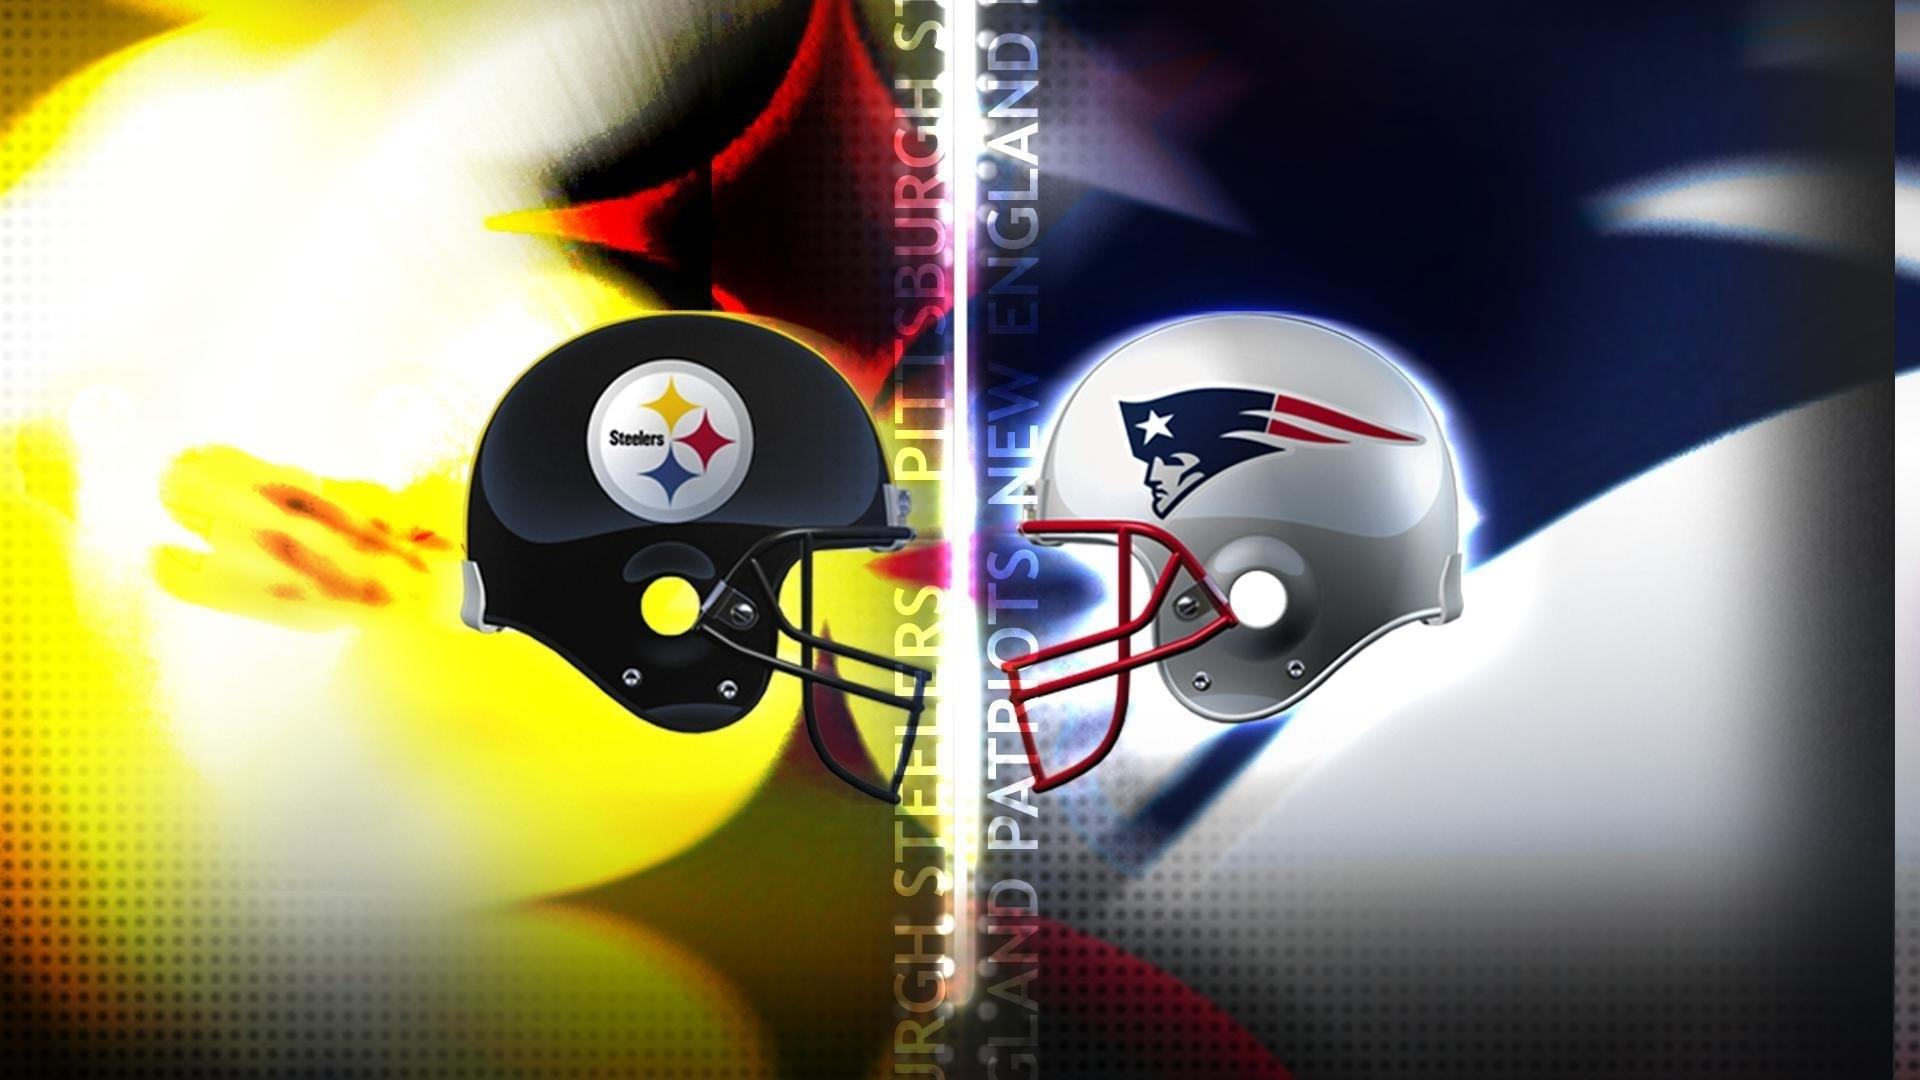 Football, Nfl, Patriots, Pittsburgh Steelers, Steelers, Nfl Patriots Vs  Steelers 2015 Football …